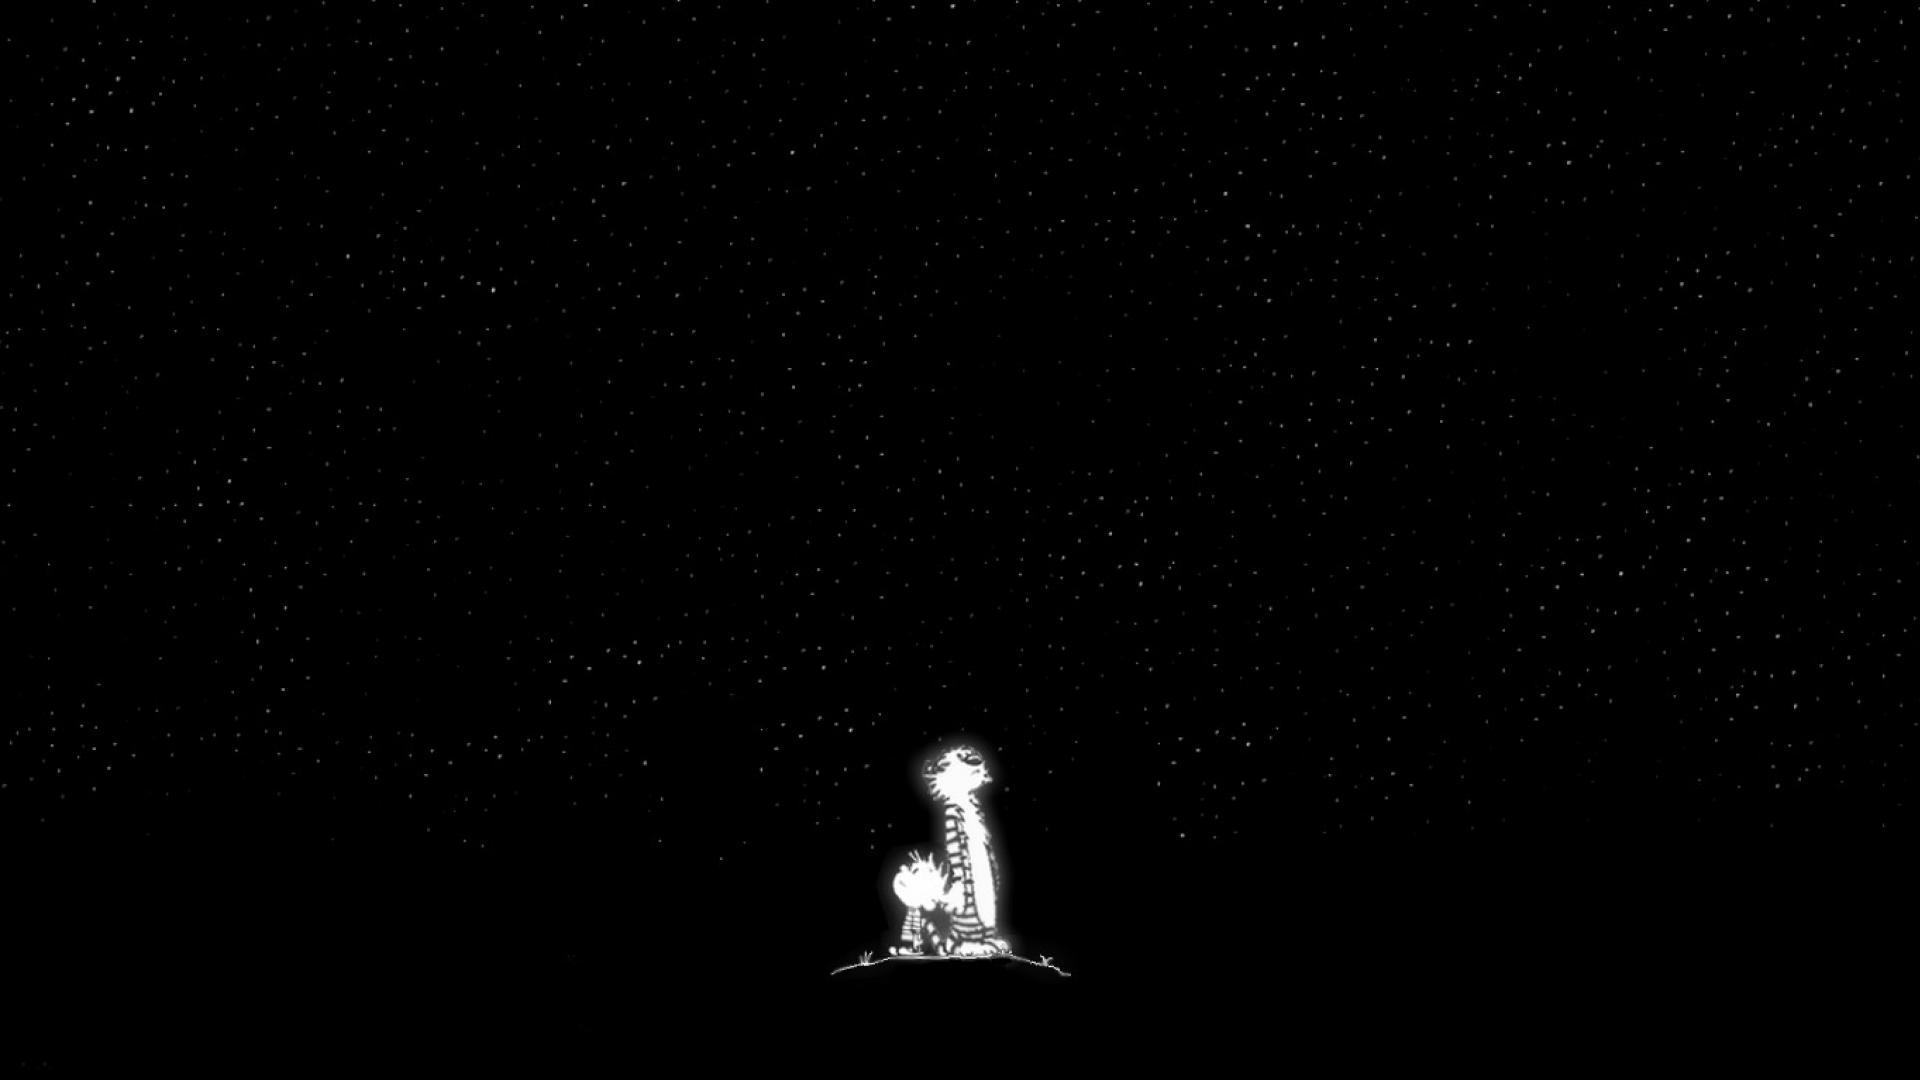 Free Download Stars Calvin And Hobbes Night Sky Wallpaper 14047